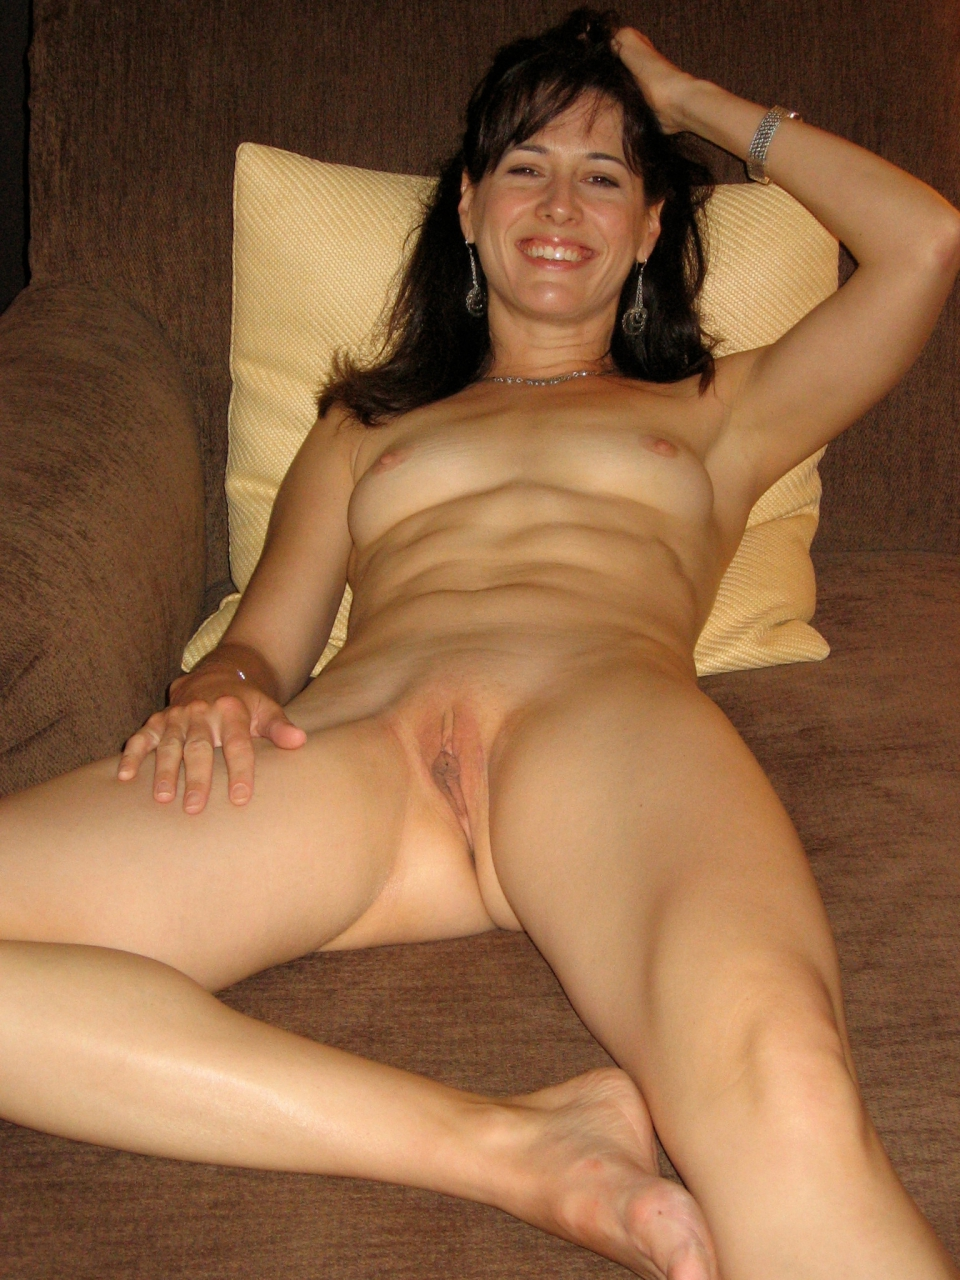 amateur milf wife nude full size